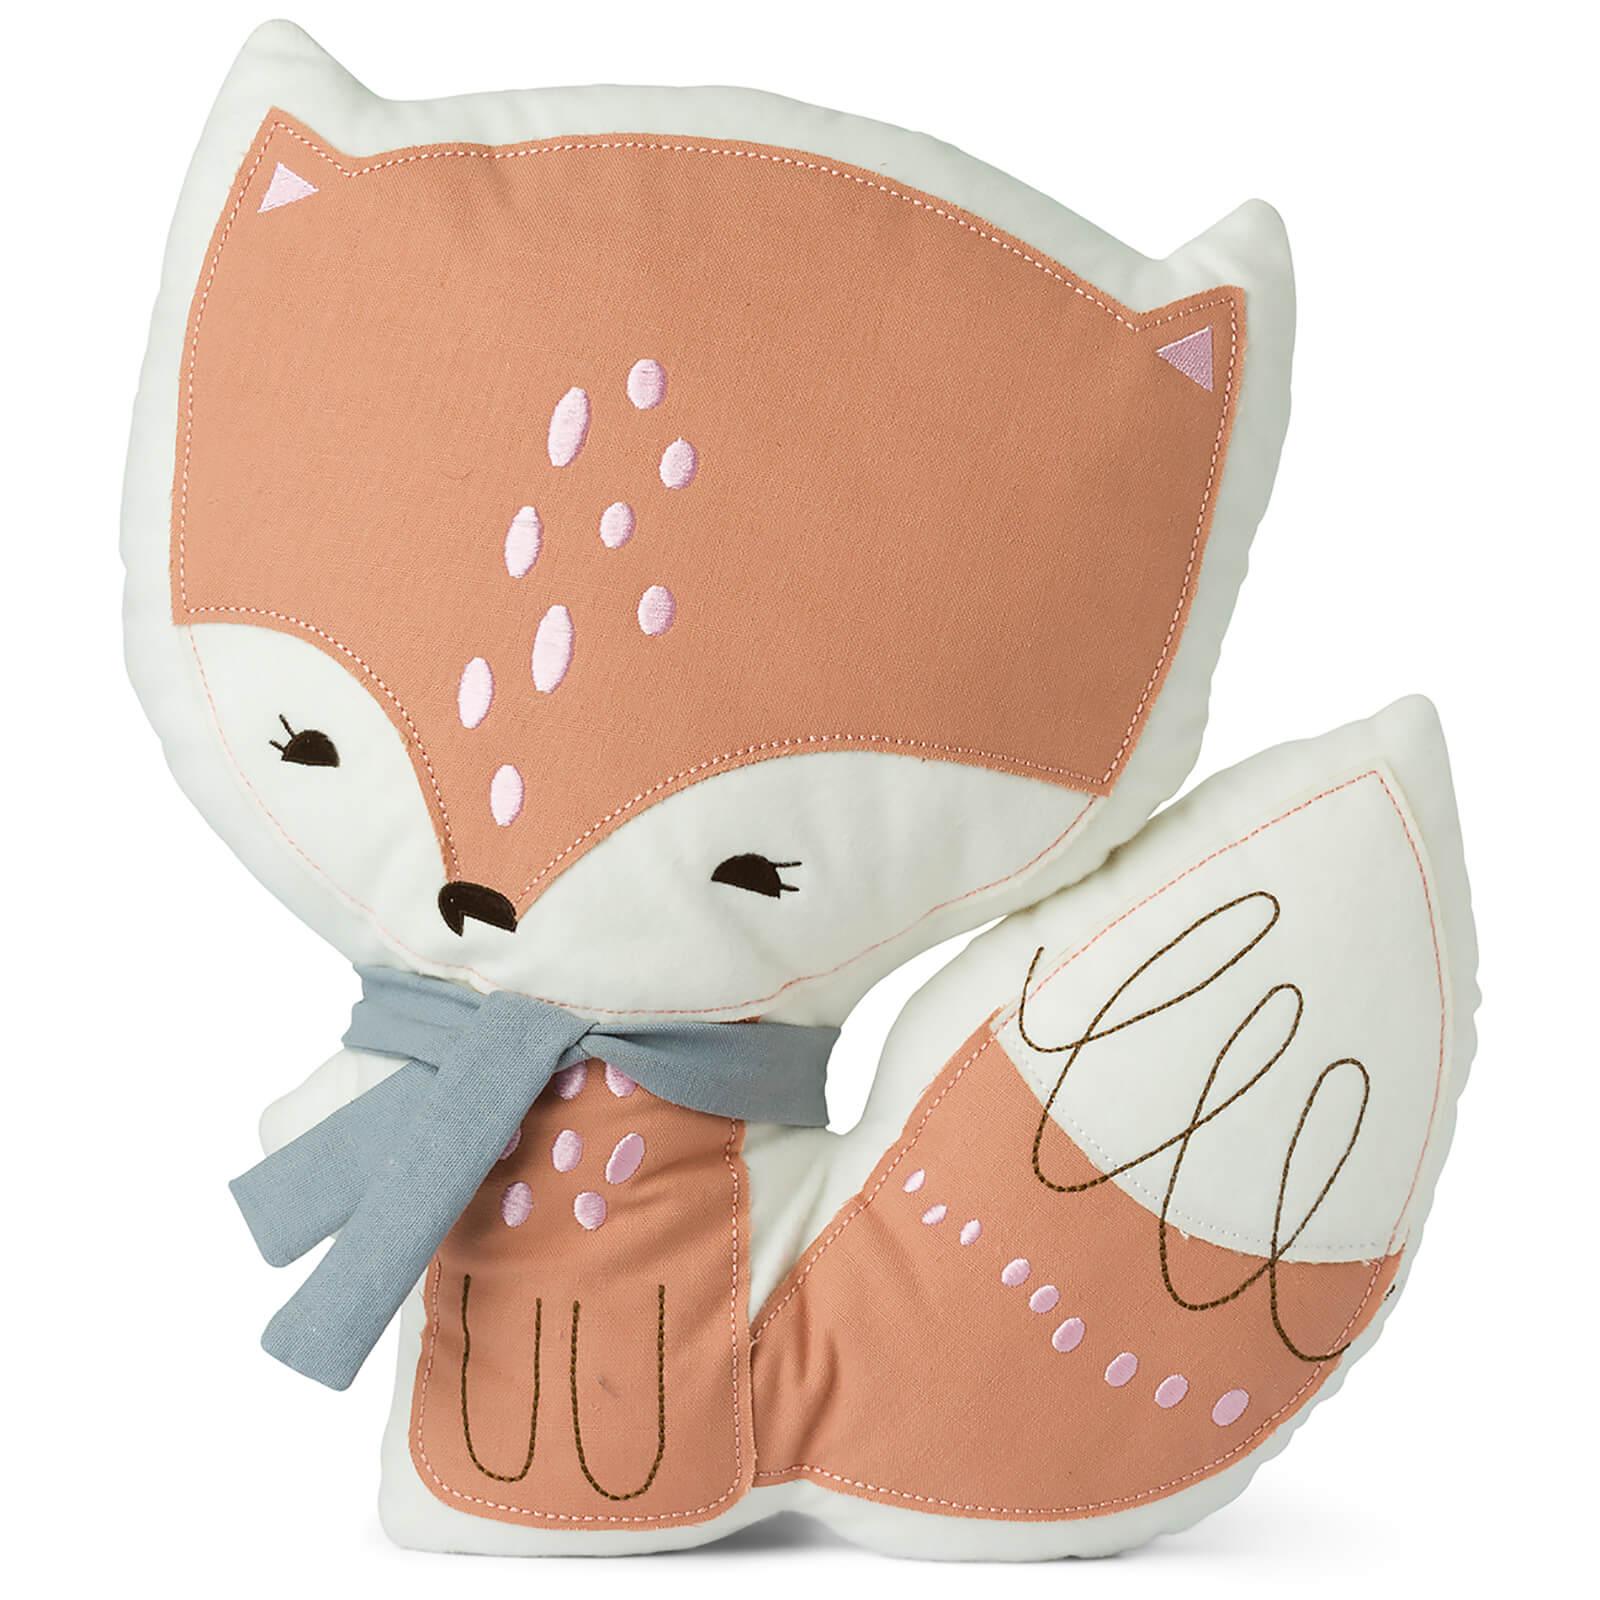 Picca Loulou Fox Cushion